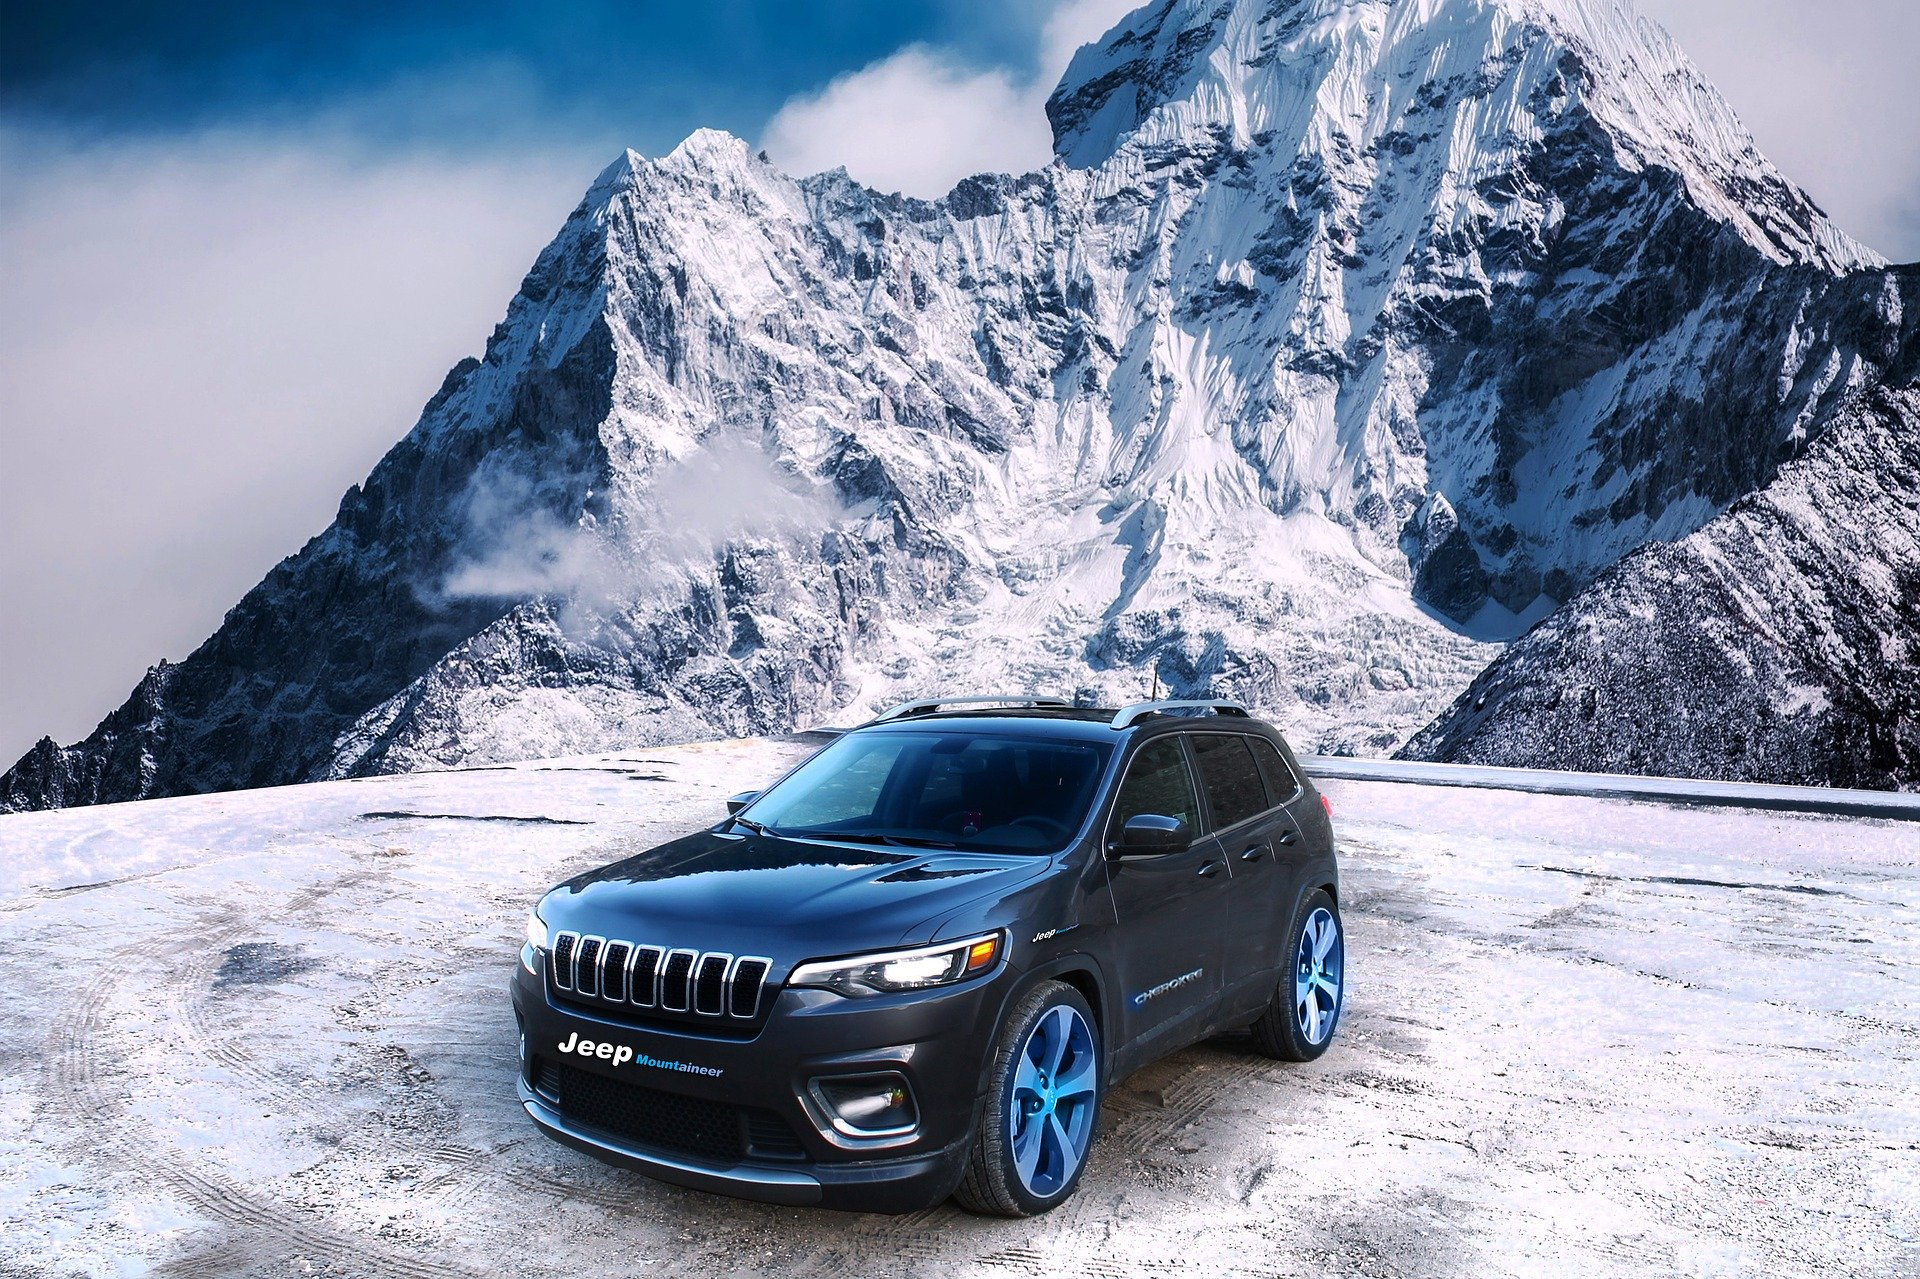 Jeep bergen sneeuw wintersportdeluxe